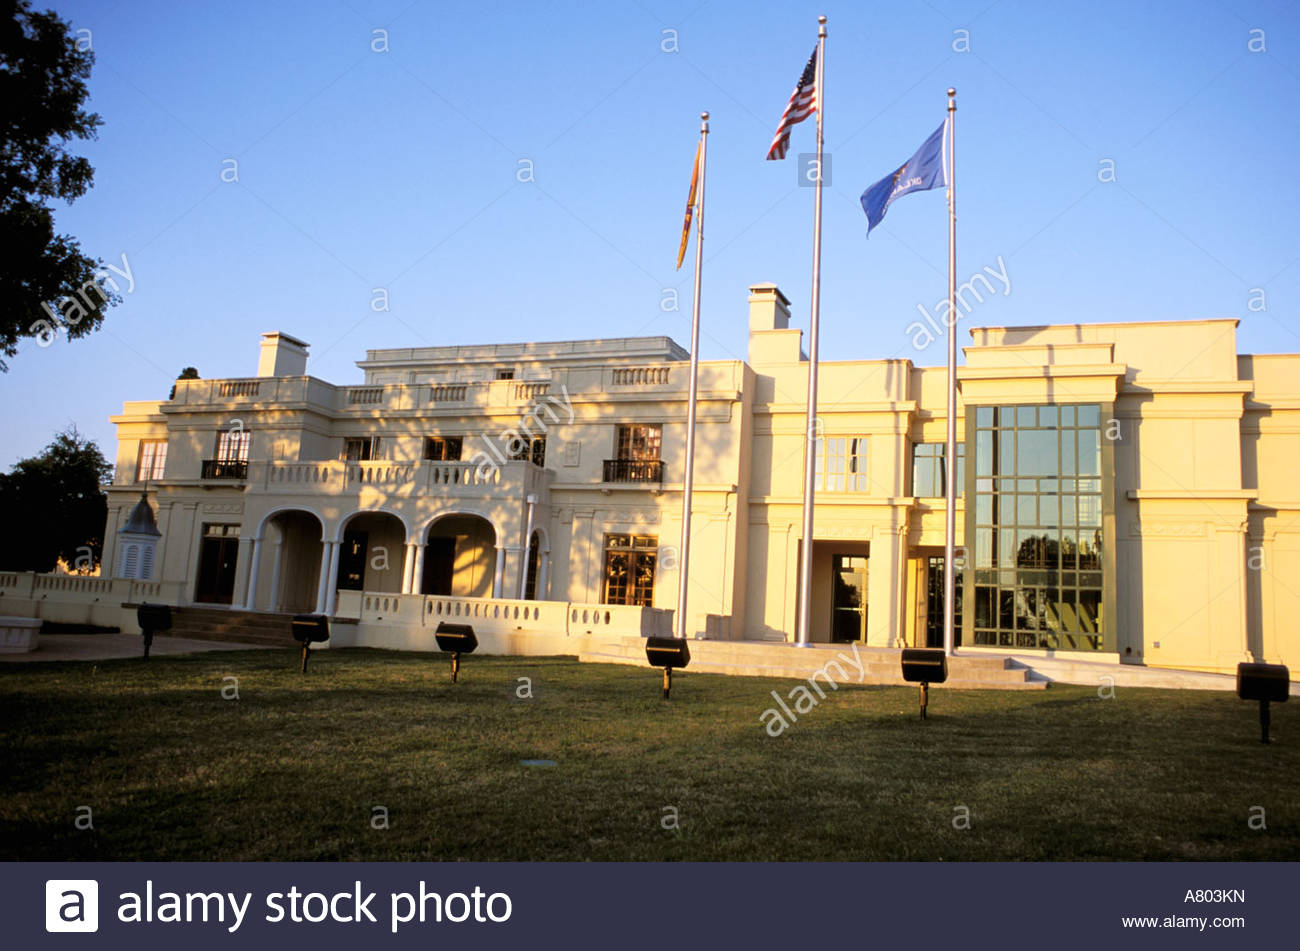 North America, USA, Oklahoma, Tulsa. Tulsa Garden Center Mansion.